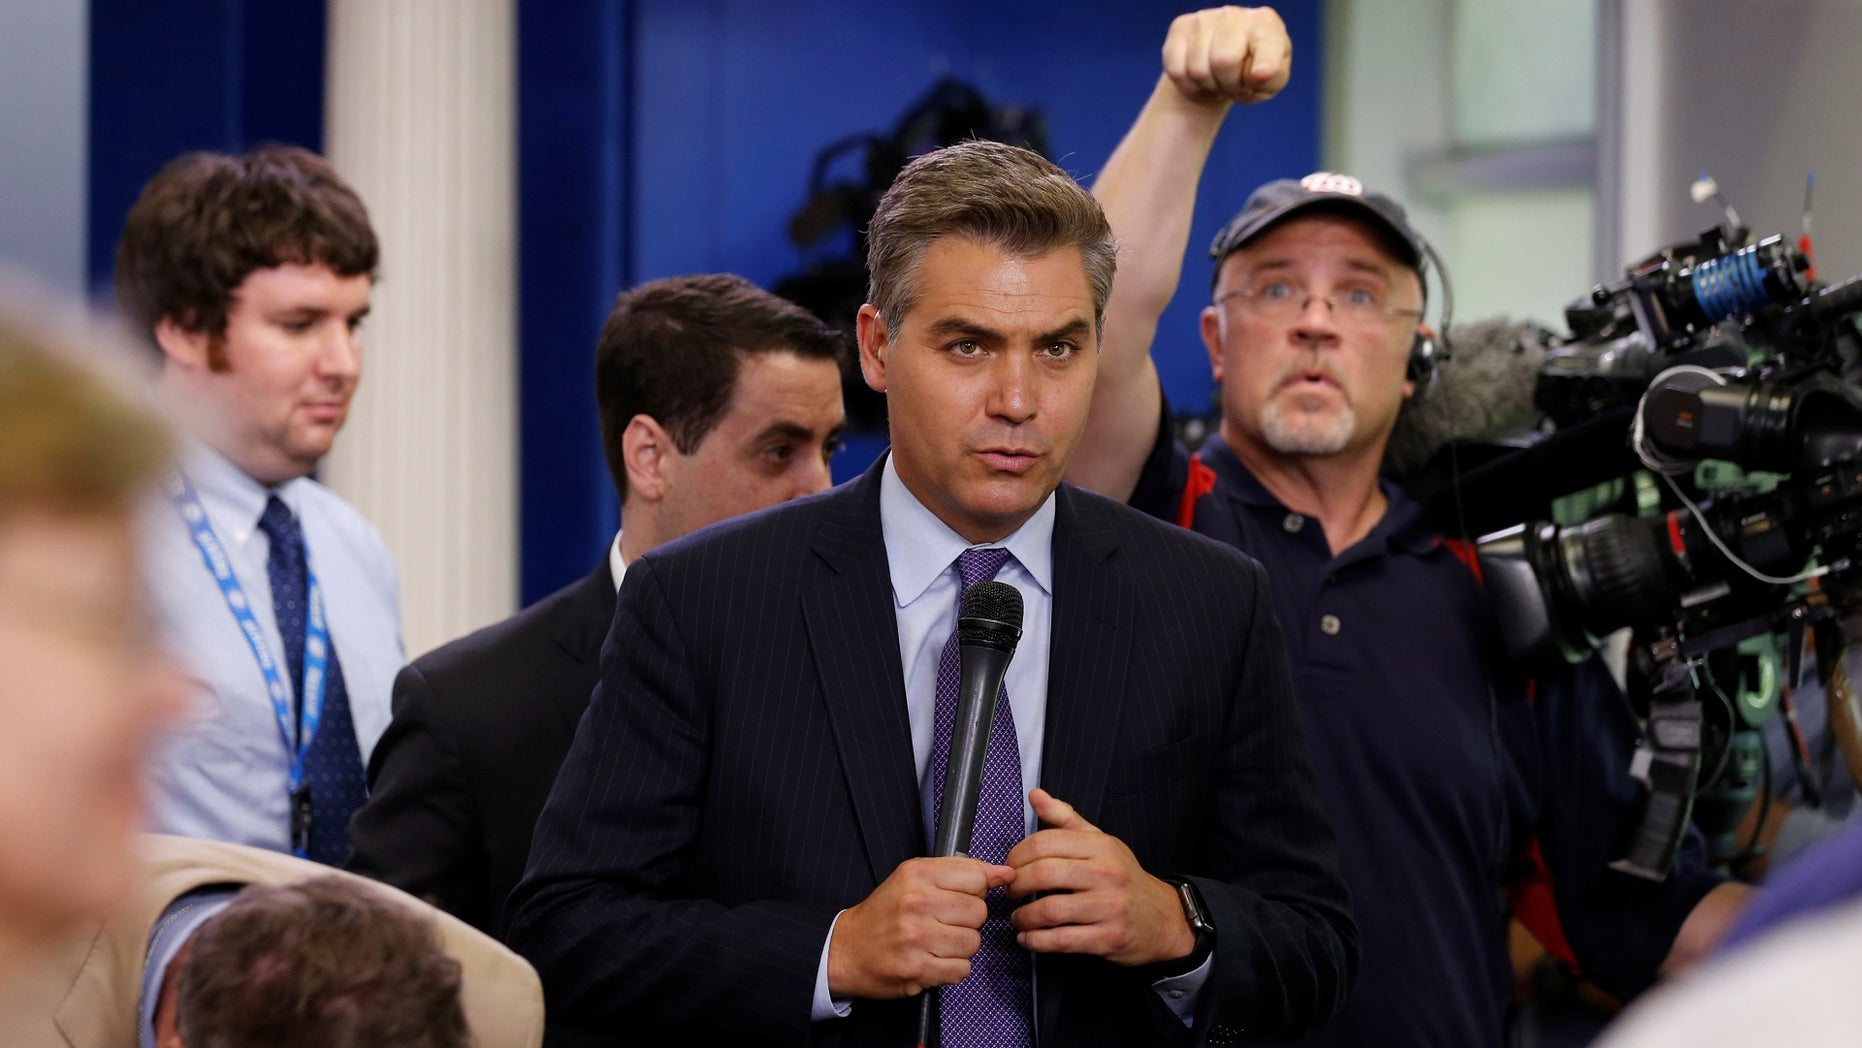 CNN Chief White house Correspondent Jim Acosta has emerged as a key figure of the anti-Trump media.